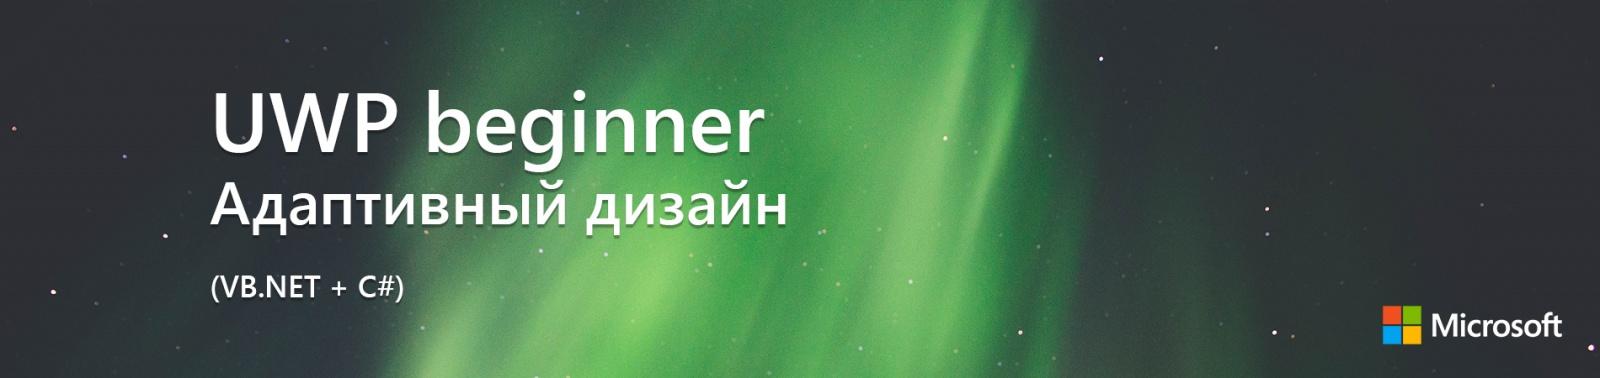 UWP beginner: Адаптивный дизайн (VB.NET + C#) - 1